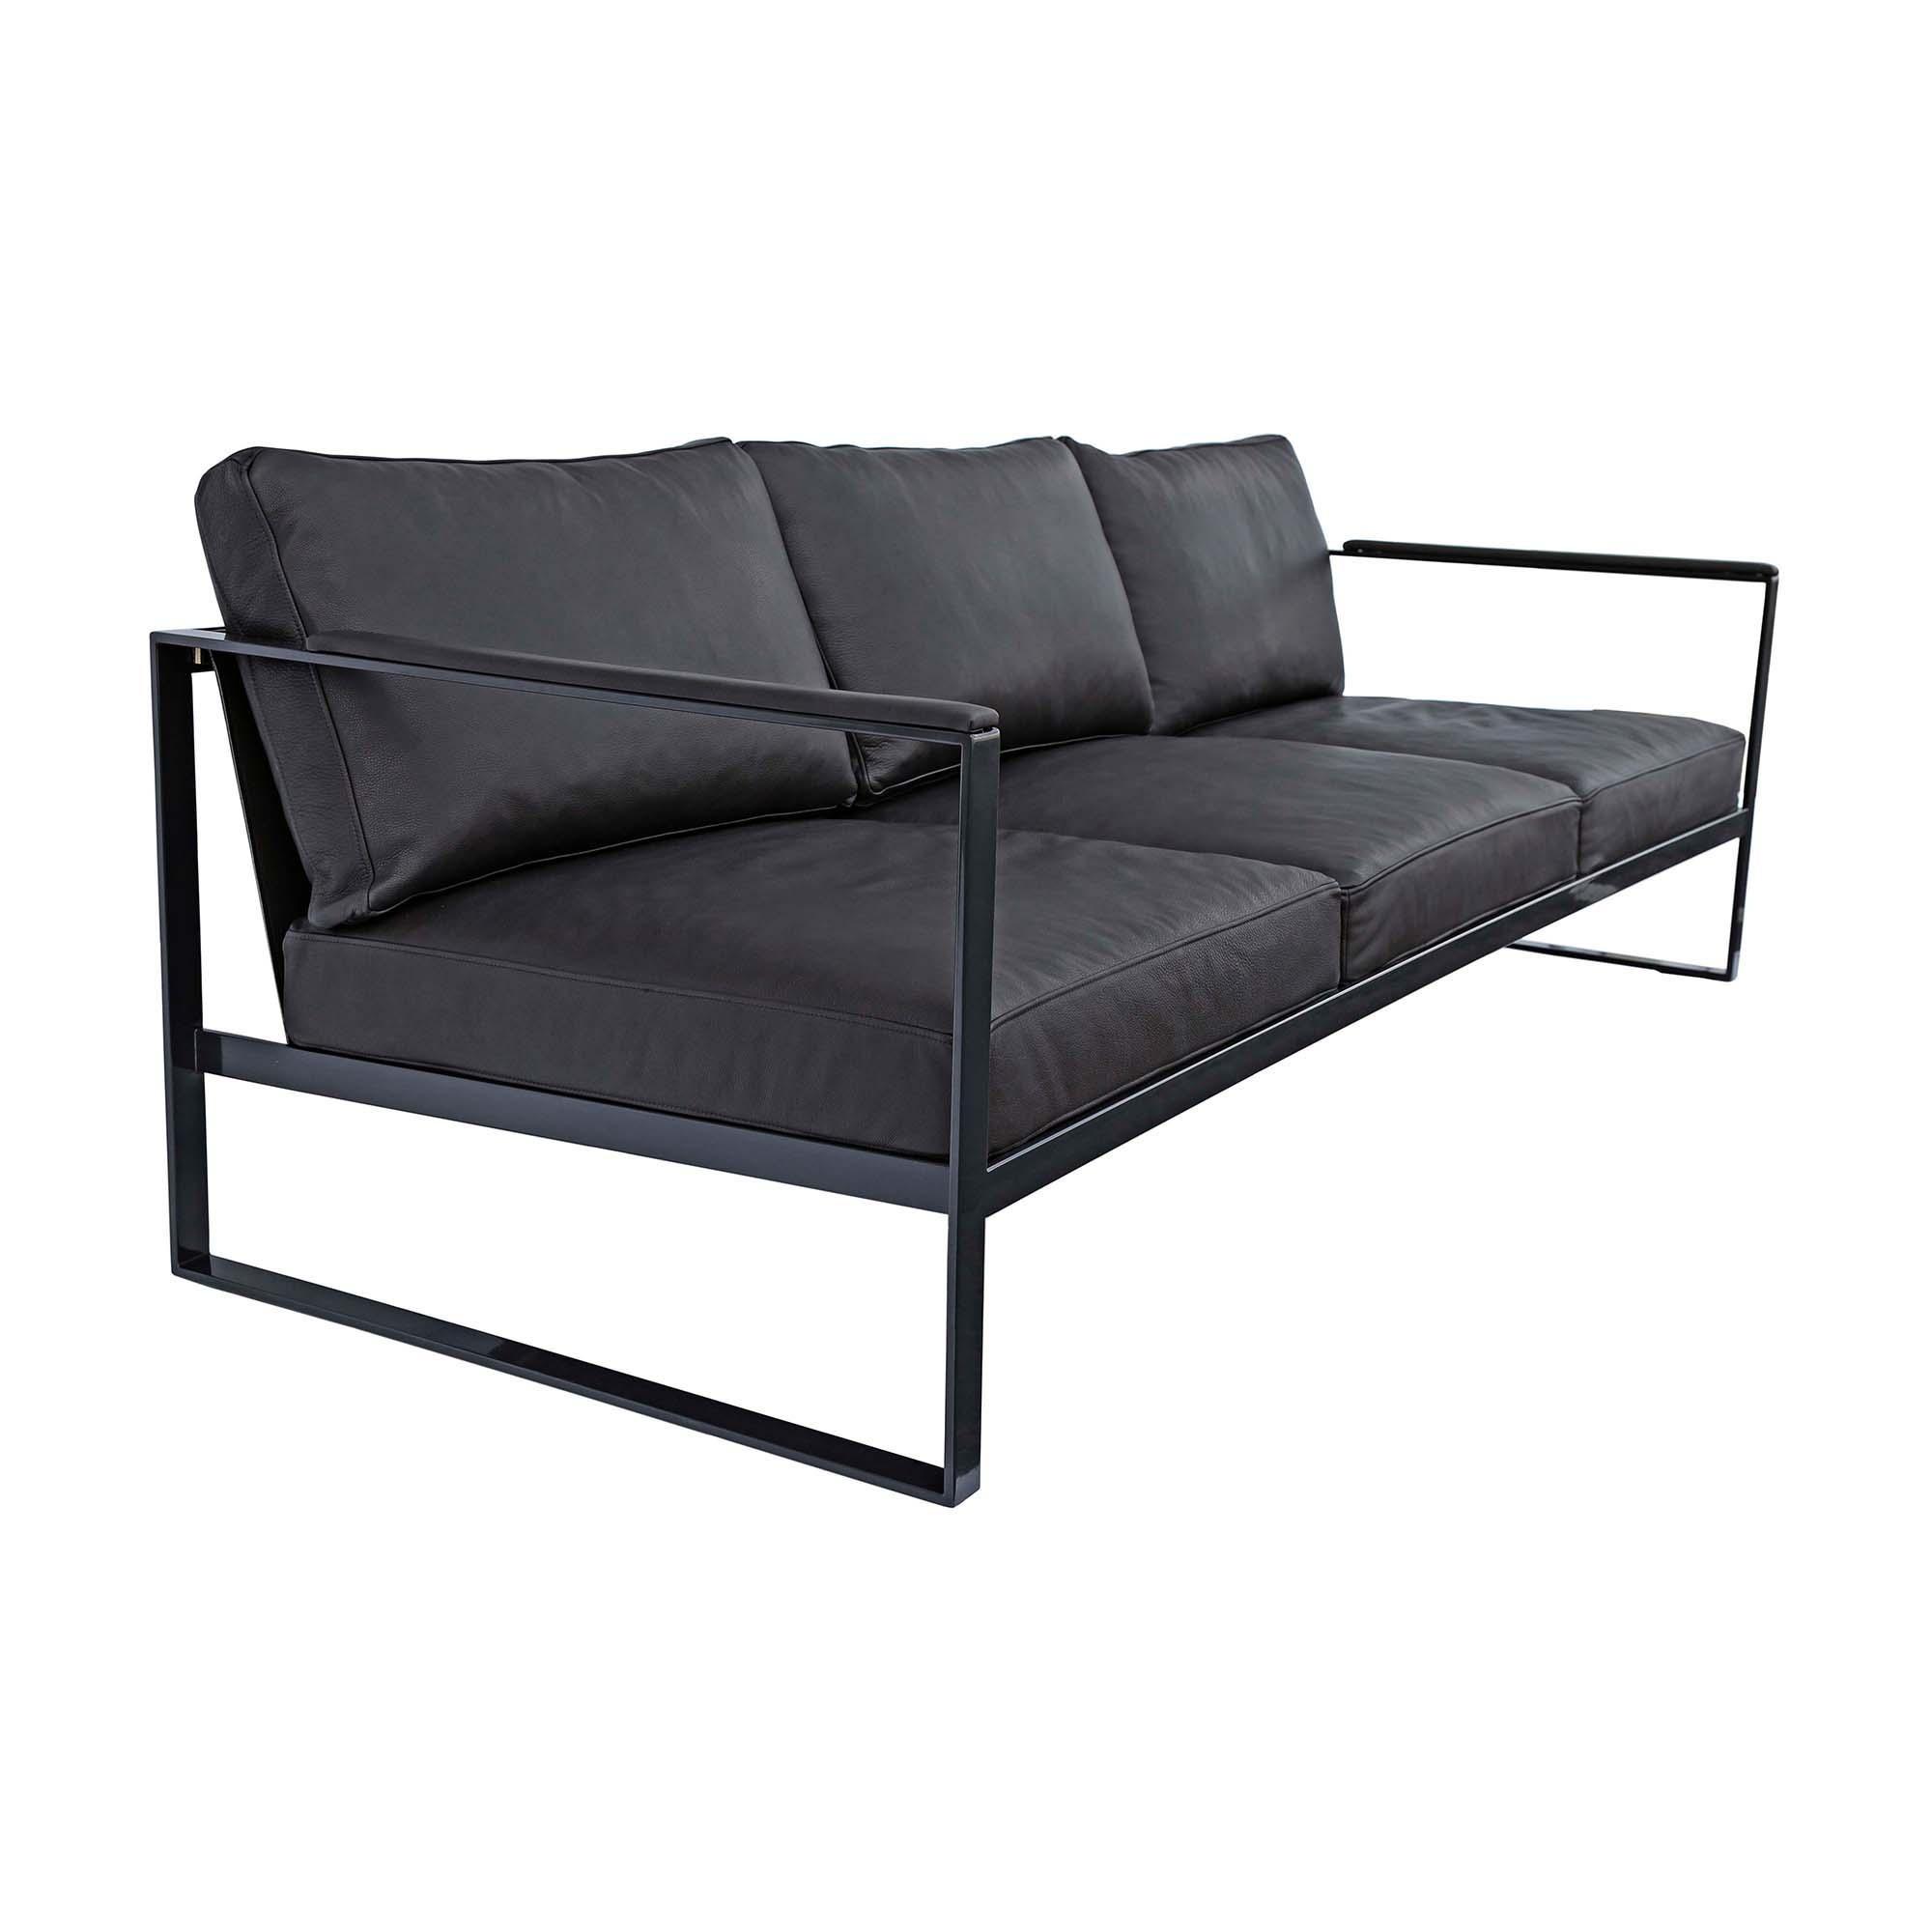 Monaco 3-Seater Sofa